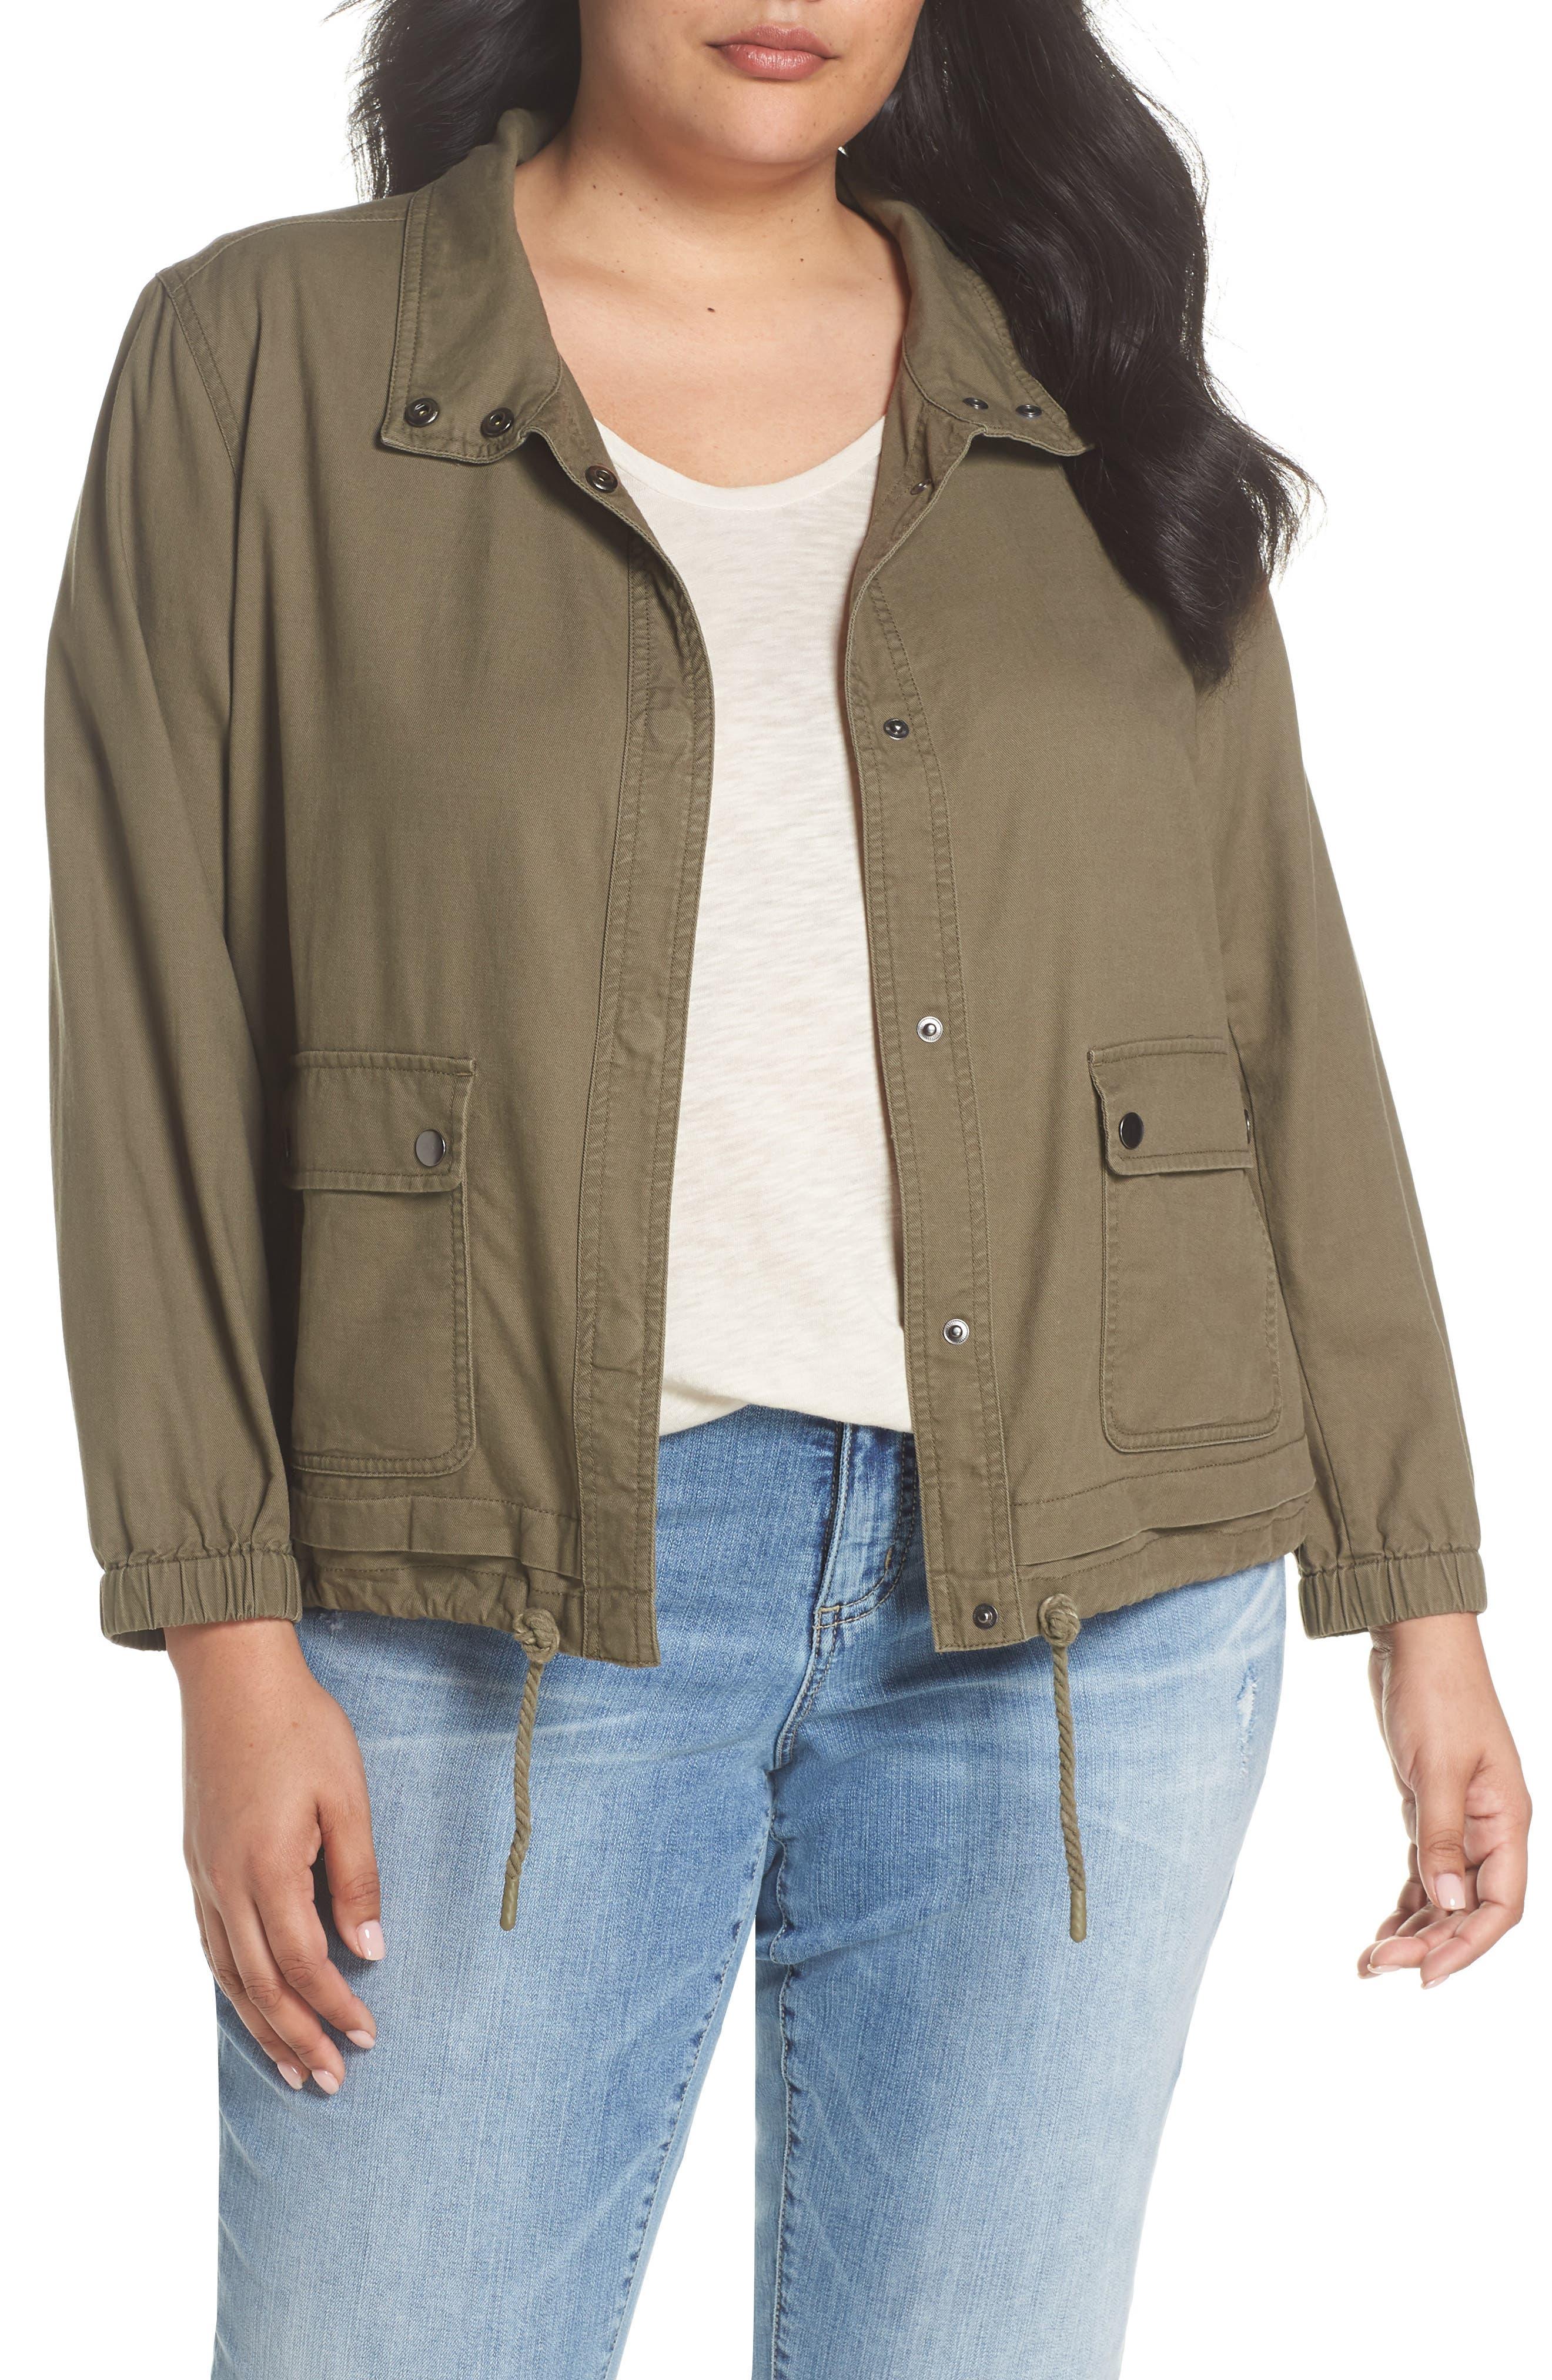 Snap Pocket Utility Jacket,                         Main,                         color, Olive Kalamata